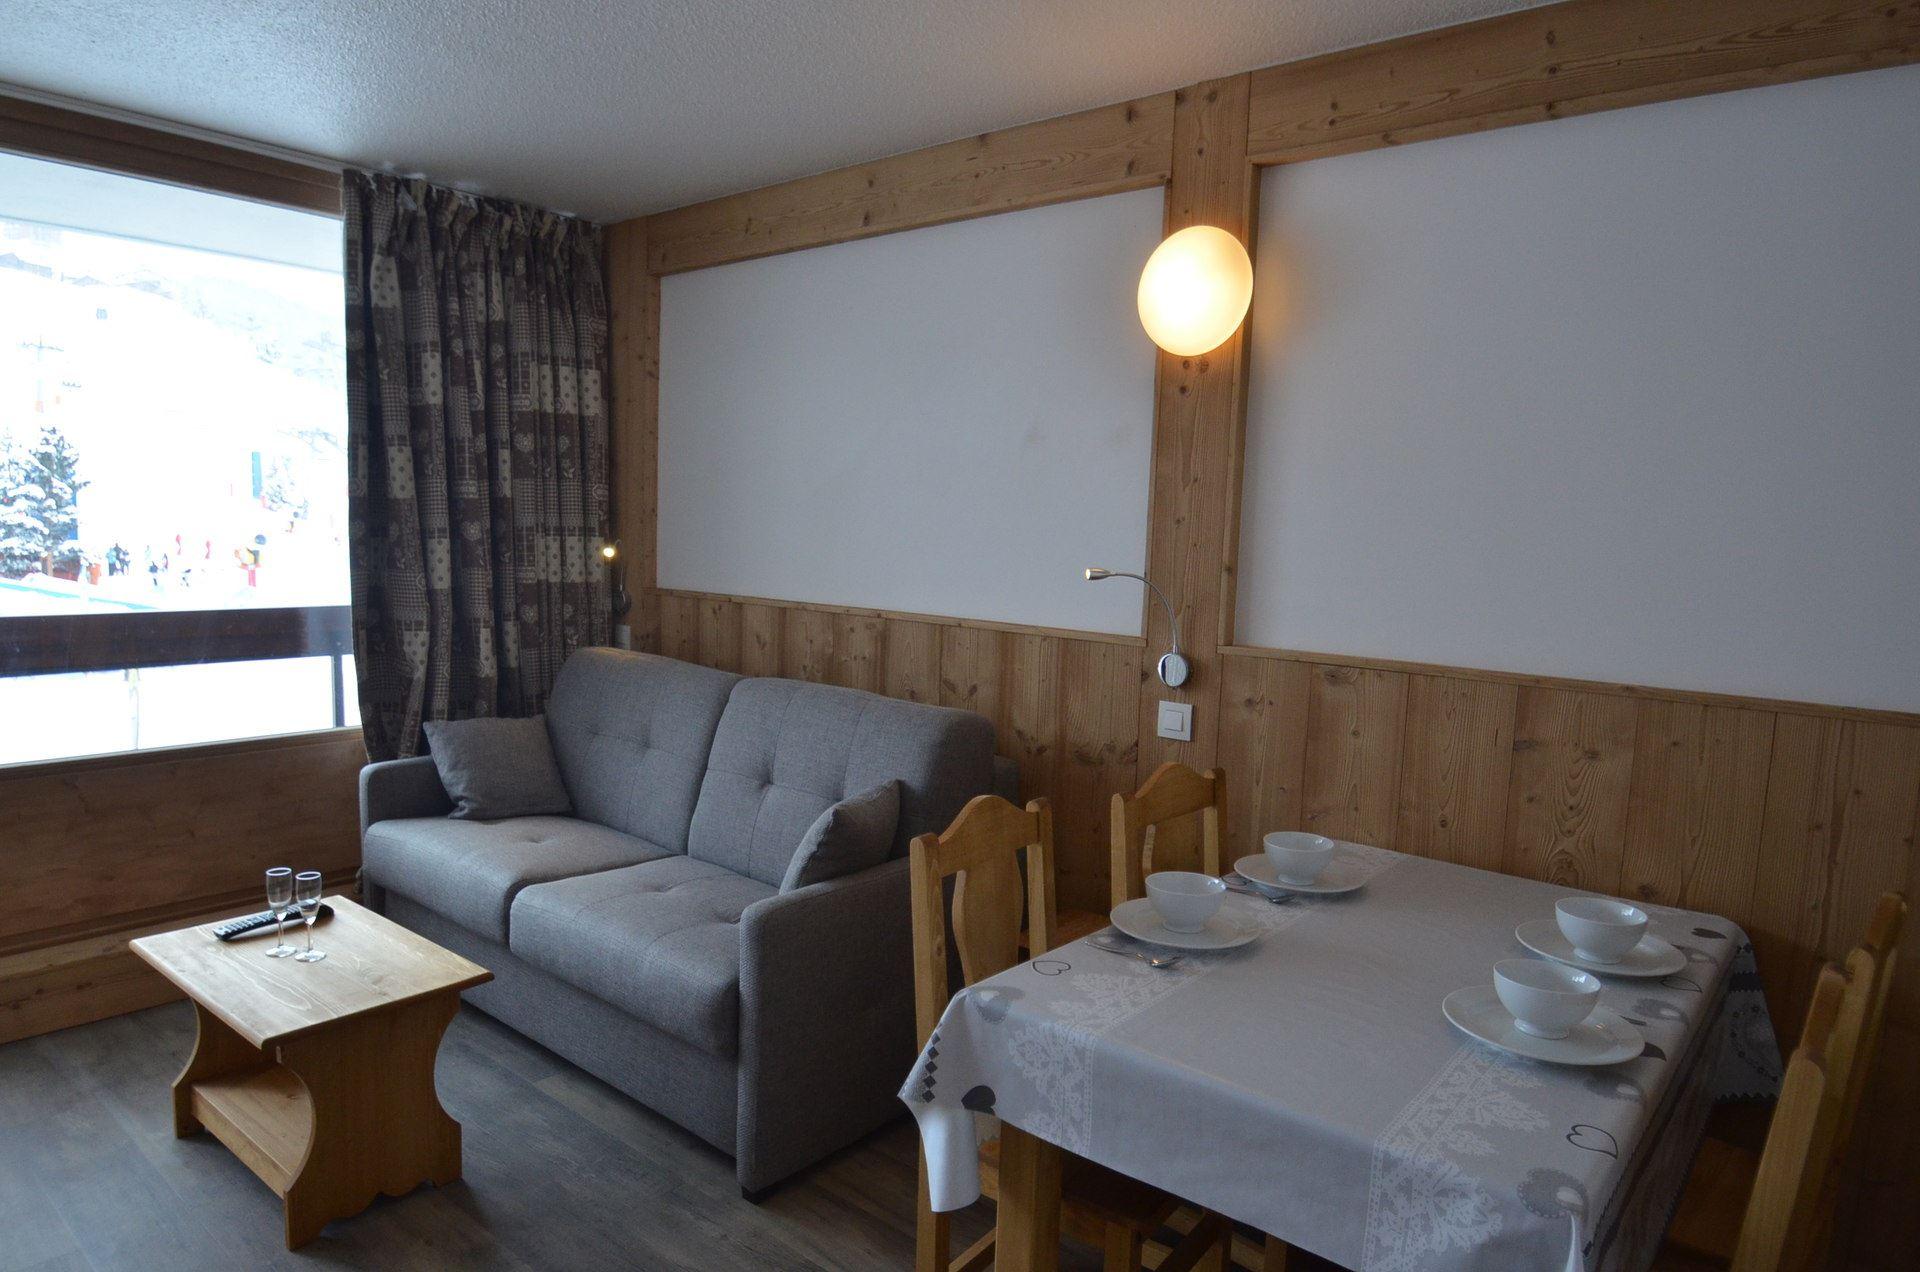 4 Pers Studio ski-in ski-out / LAC DU LOU 110